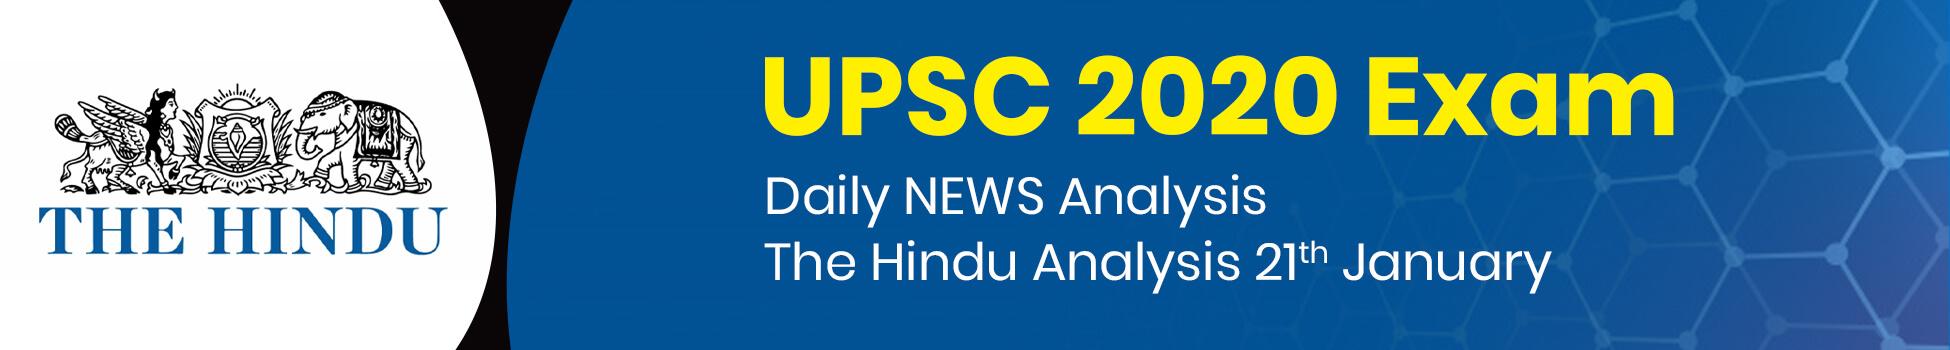 UPSC 2020 Exam - NEWS Analysis 21th January